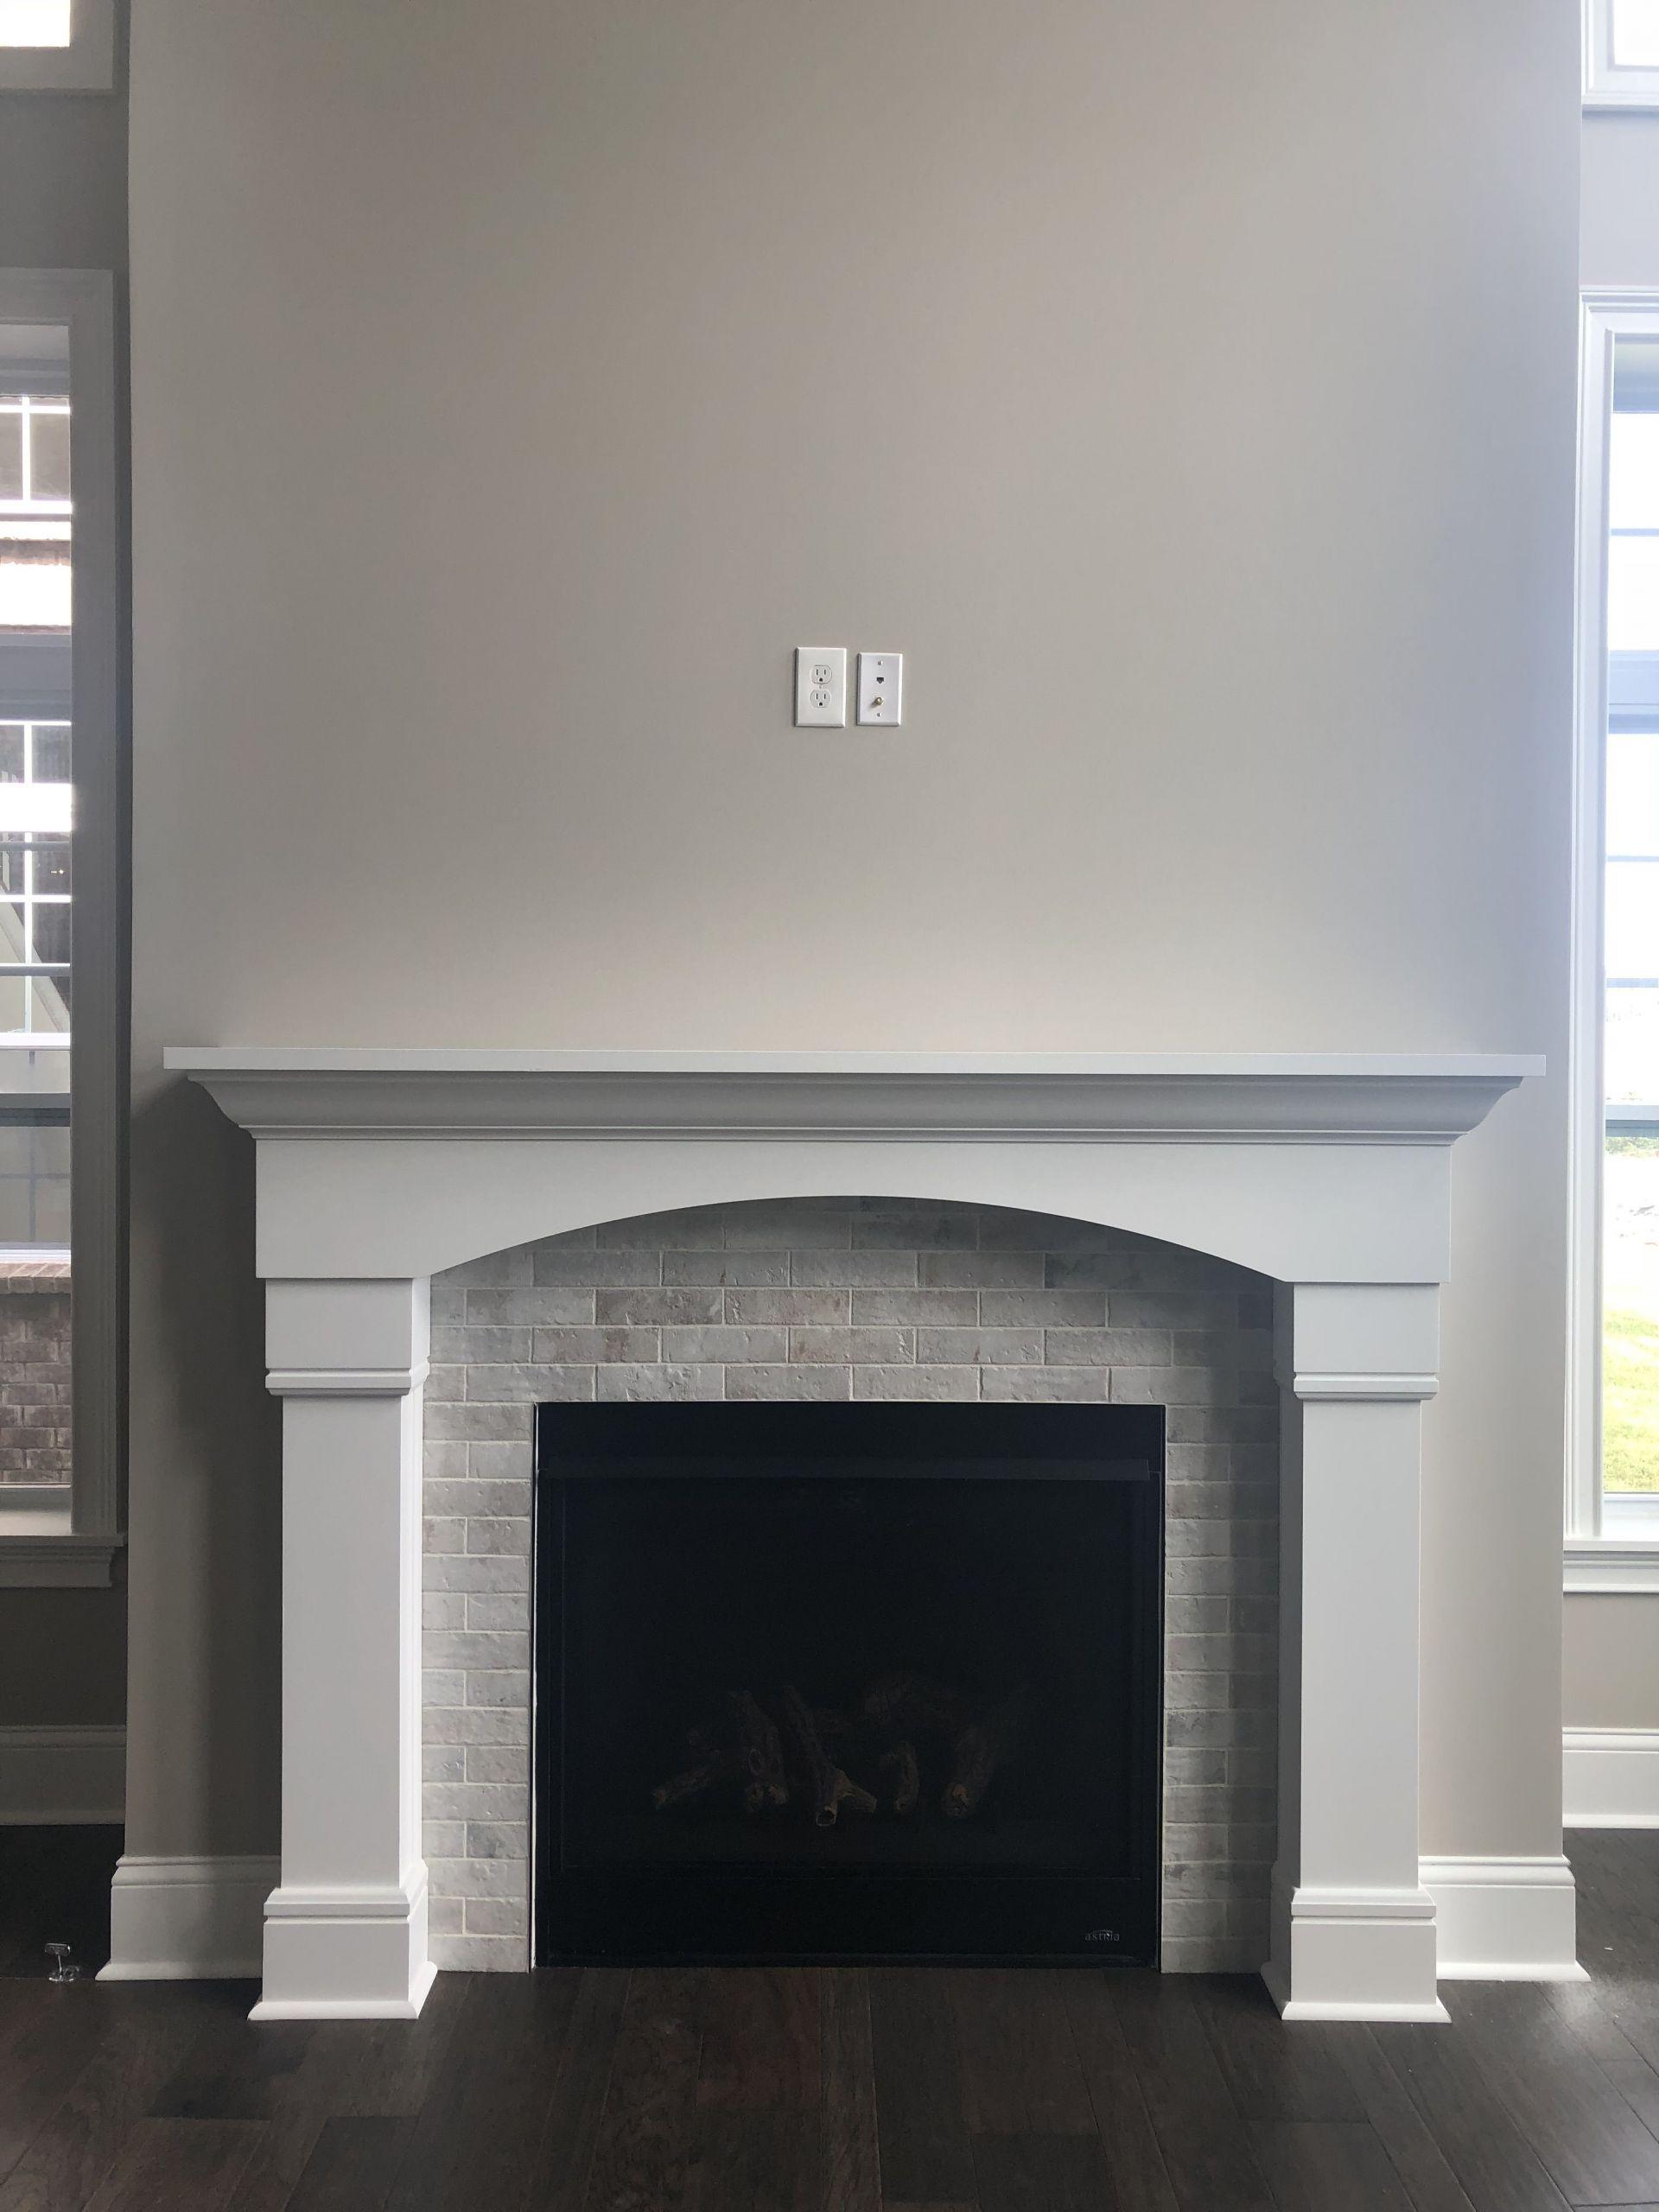 Tile Surround Fireplace Luxury Mantle 2 Brickwork 2x8 Studio Tile Surround